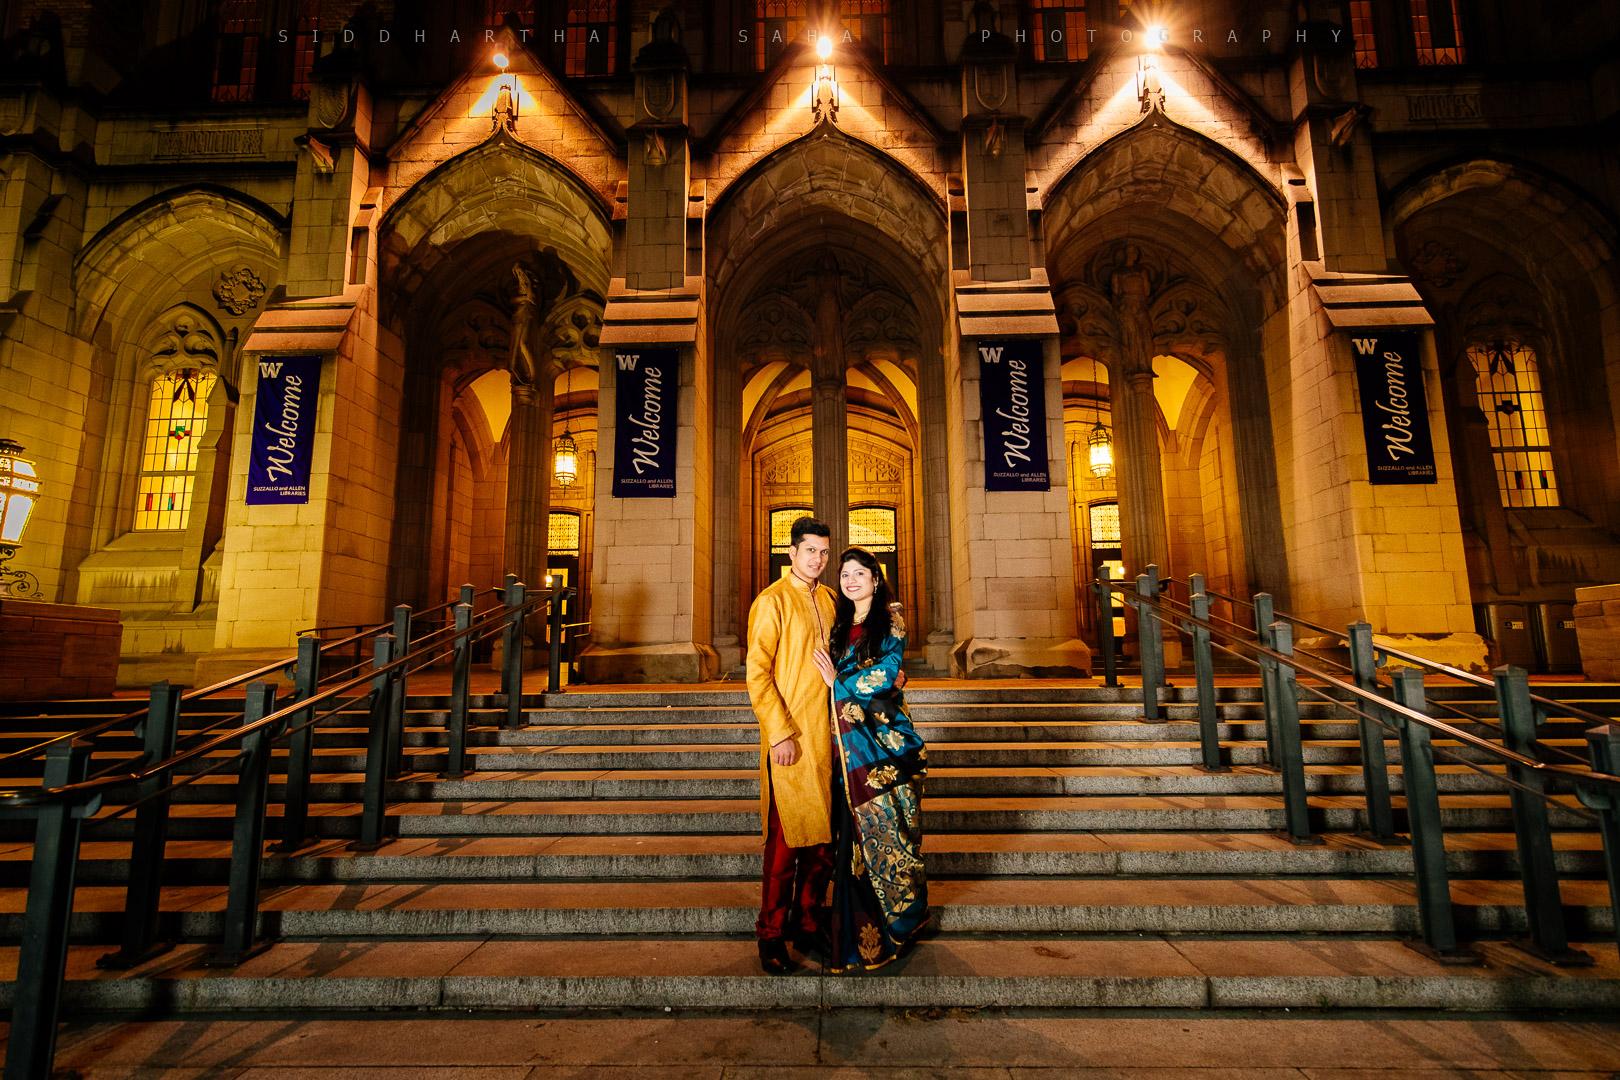 Siddhartha Saha Photography (www.siddphoto.com)